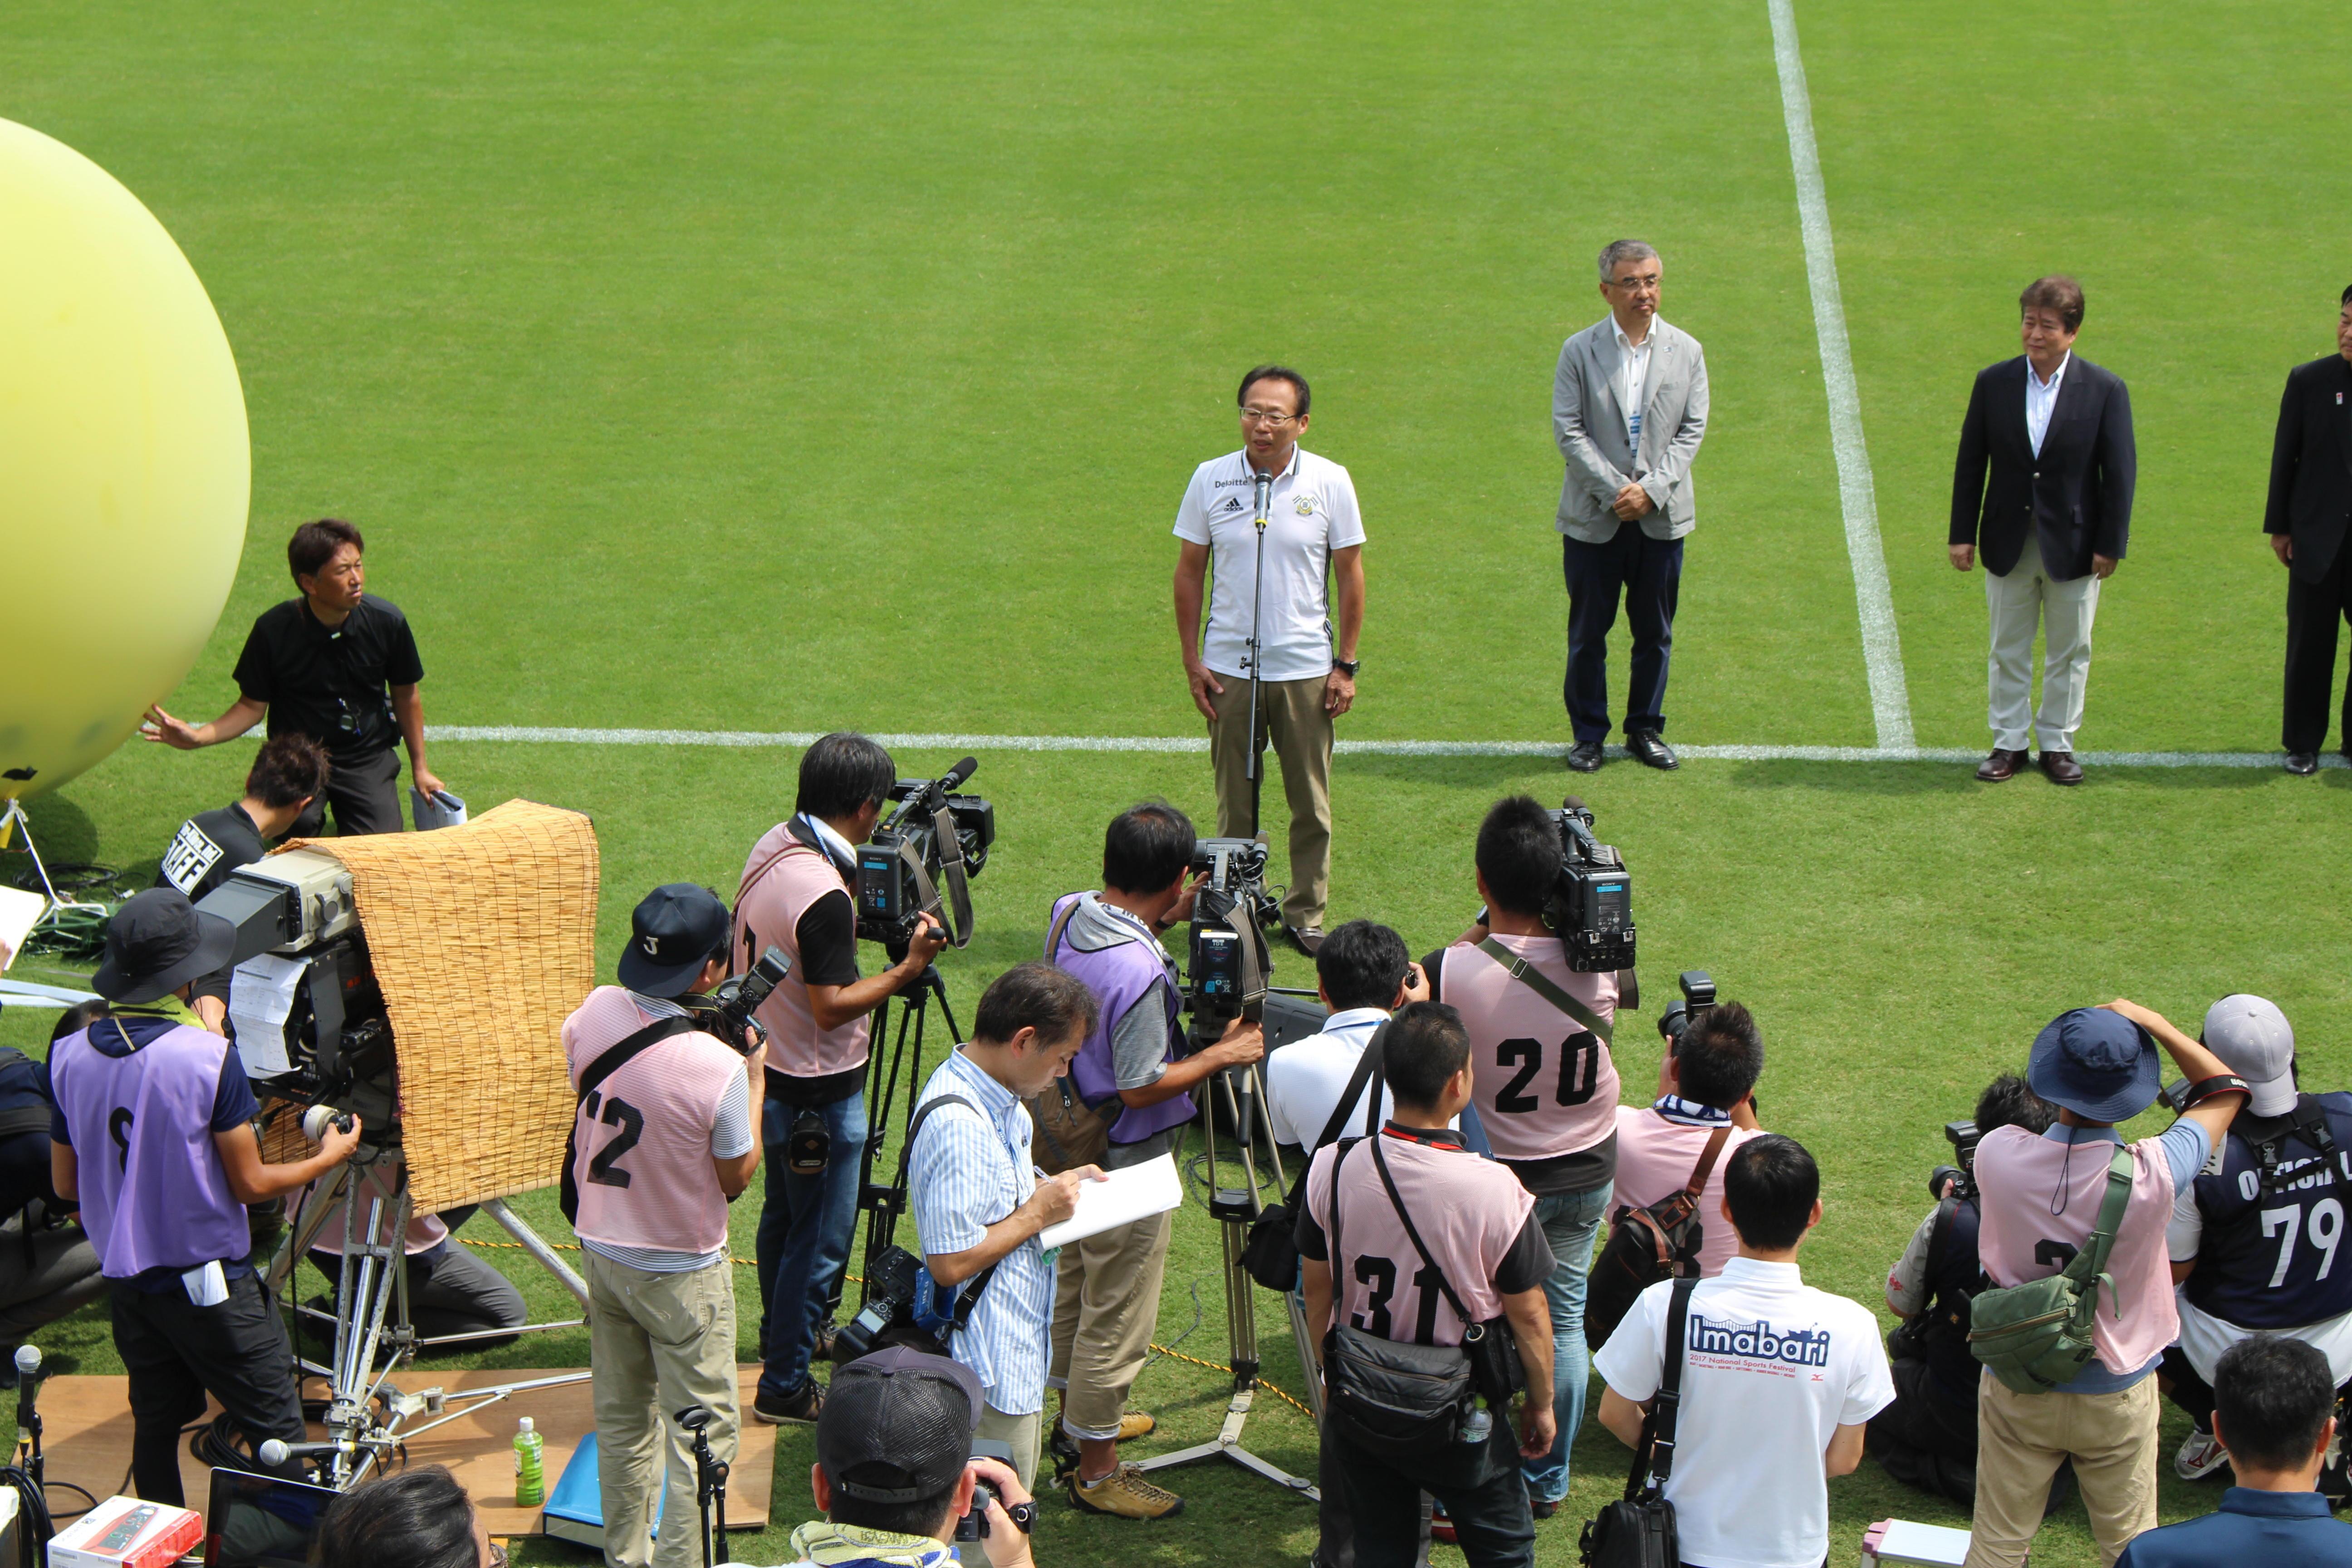 http://news.yoshimoto.co.jp/20170912165846-50000bdb82babaf67e0f829af7d94209474c9fa0.jpg